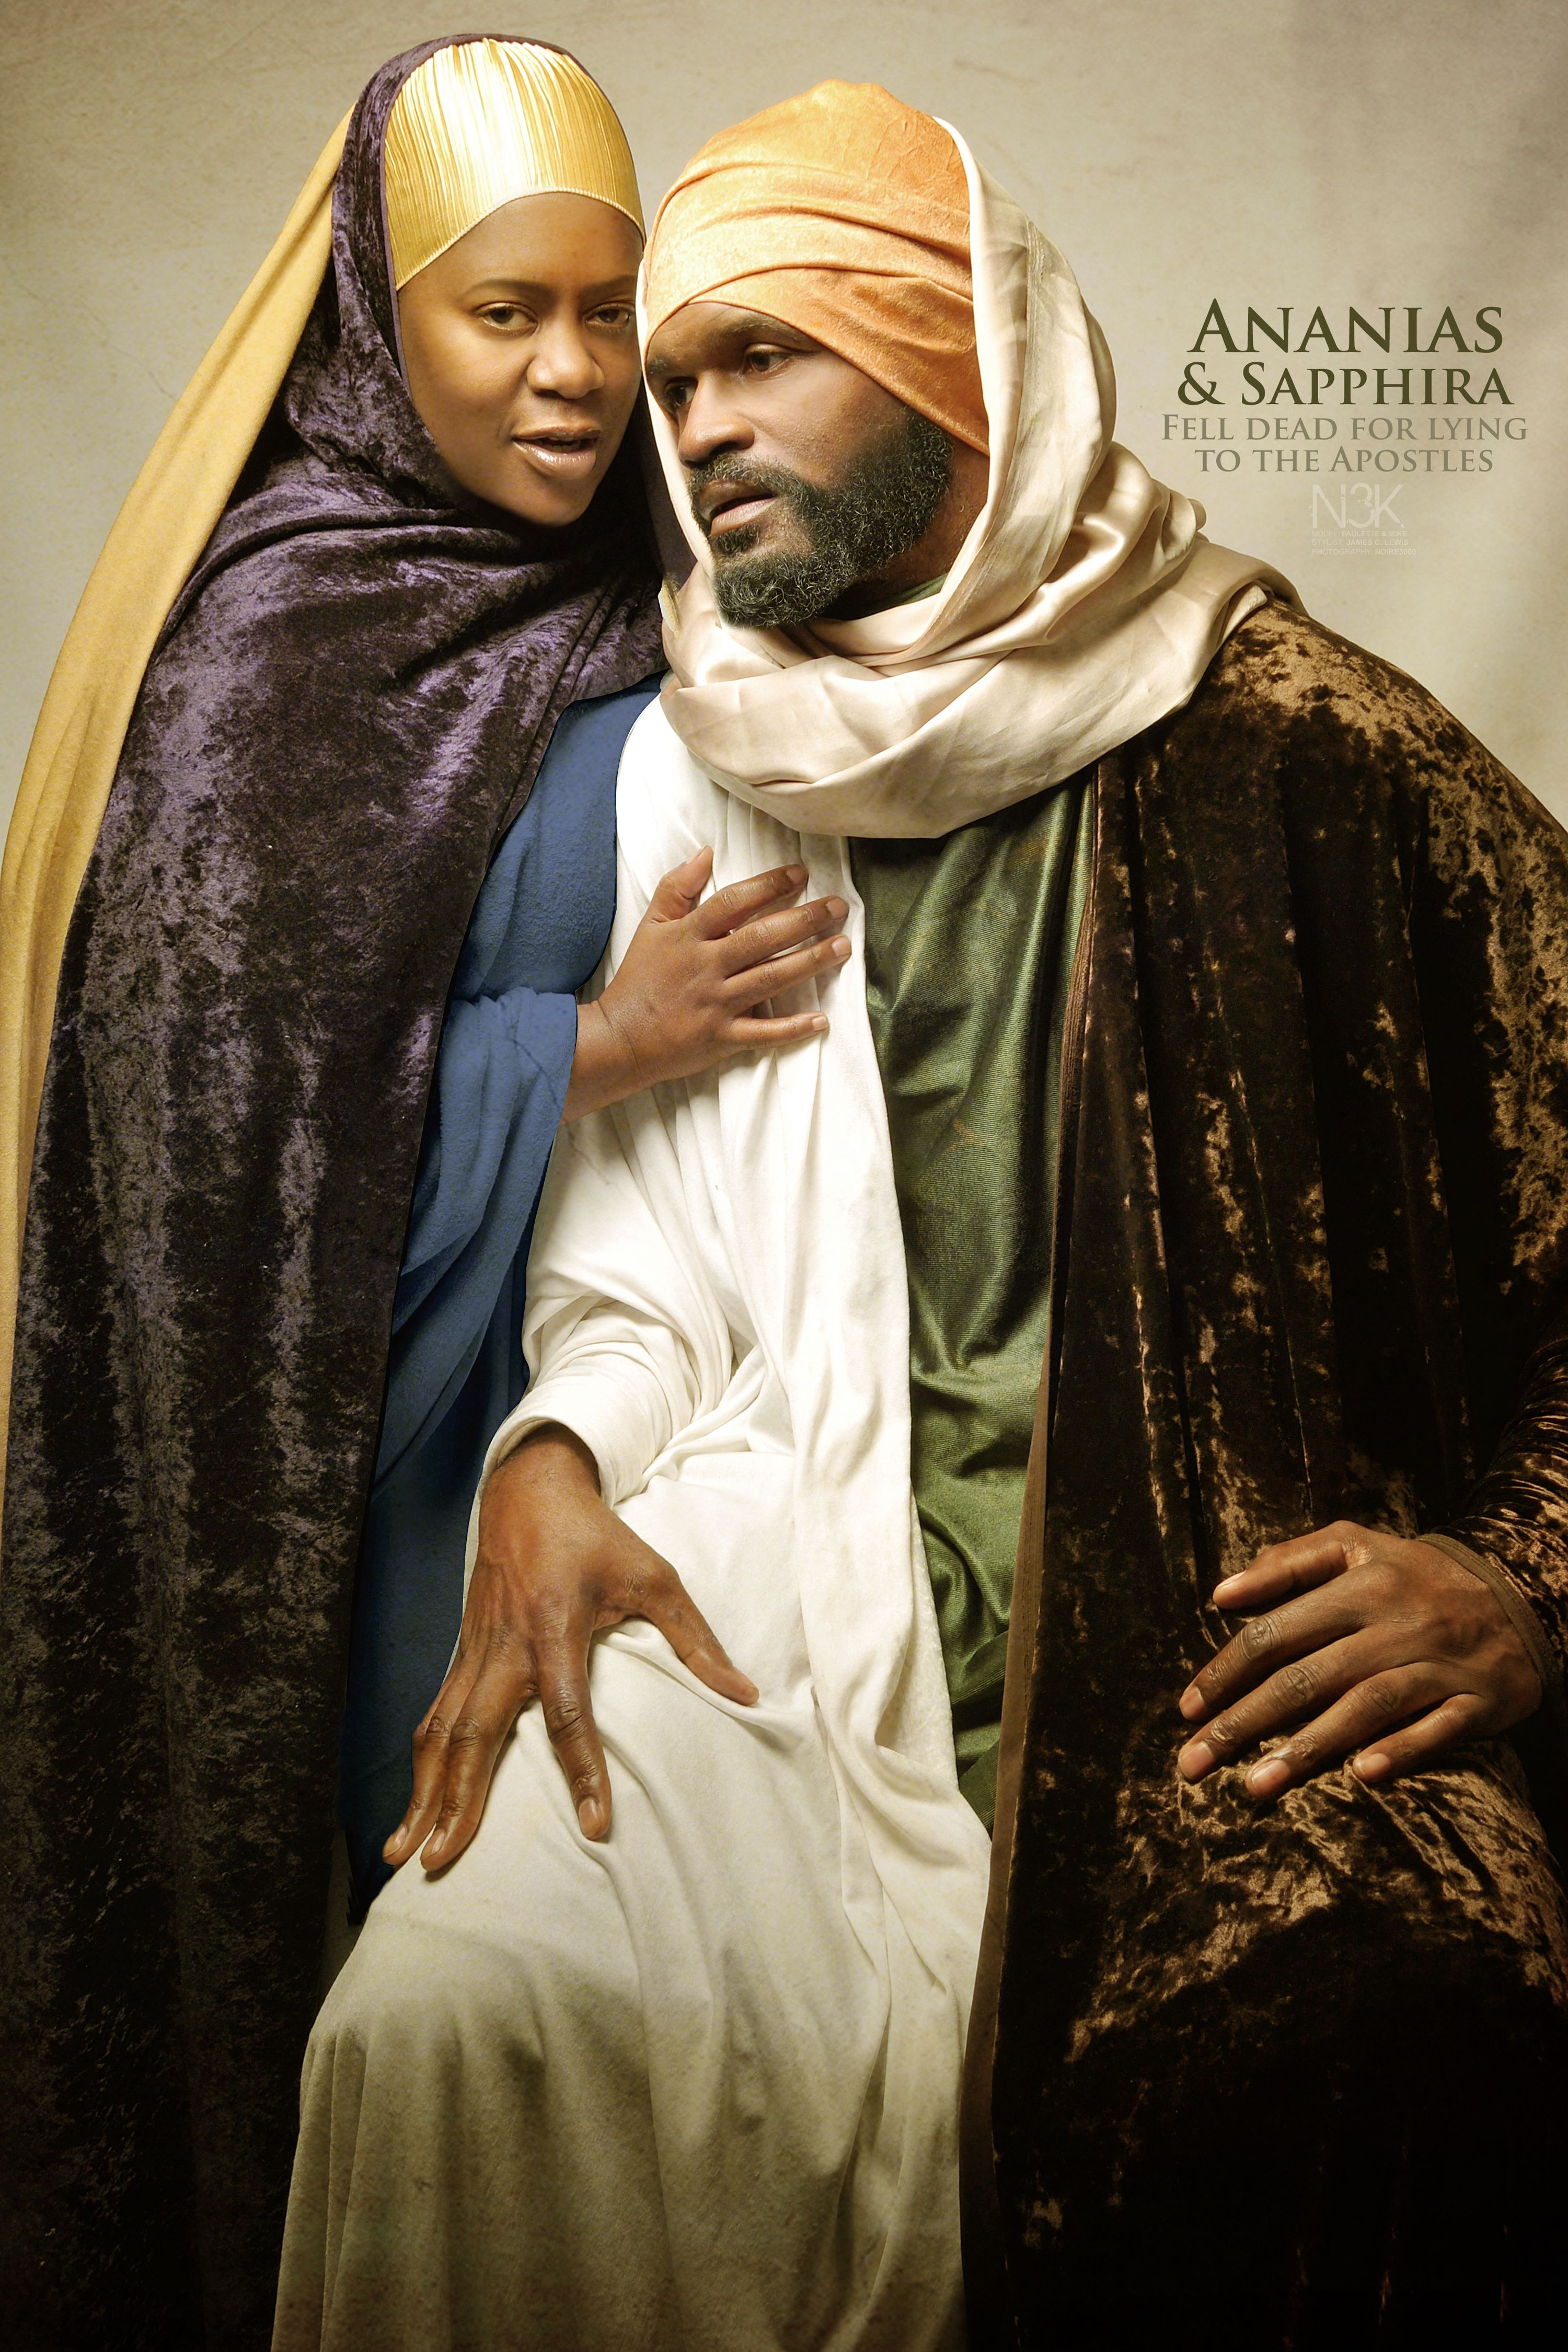 Ananias & Sapphira by International Photographer James C